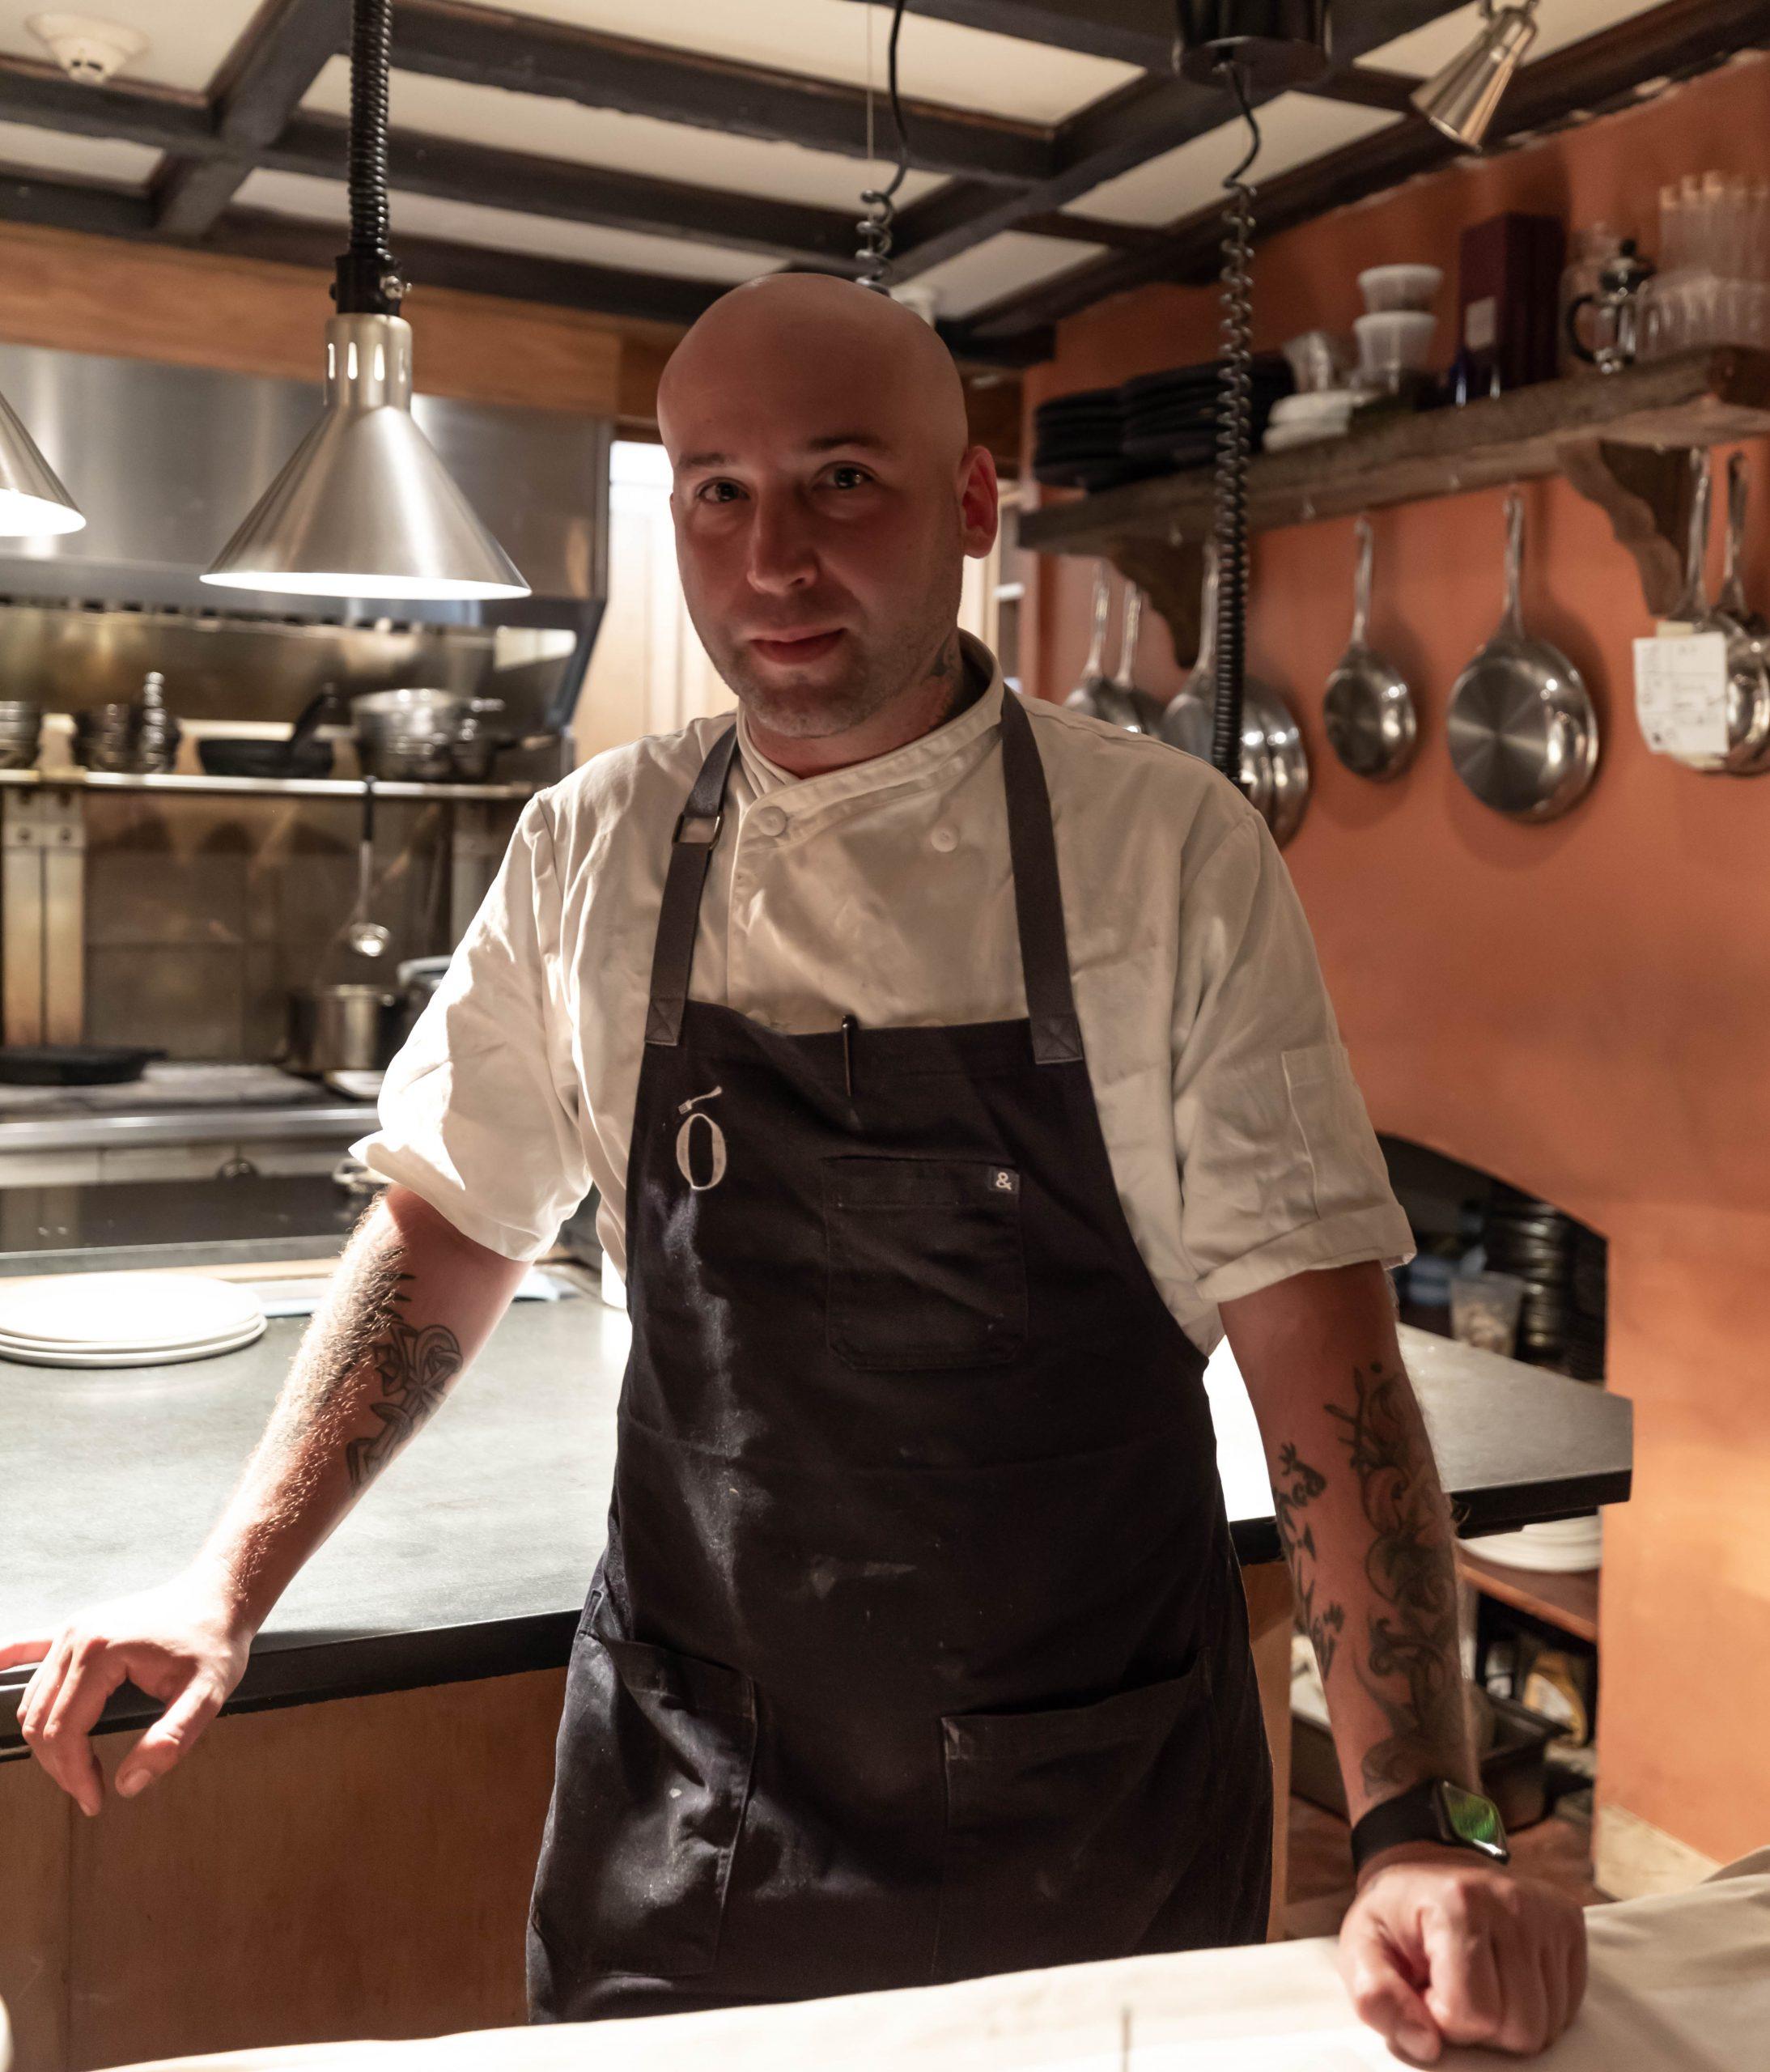 Chef Vinson Petrillo at Zero George Restaurant + Bar in Charleston South Carolina Photographed by Luxury Travel Writer Annie Fairfax